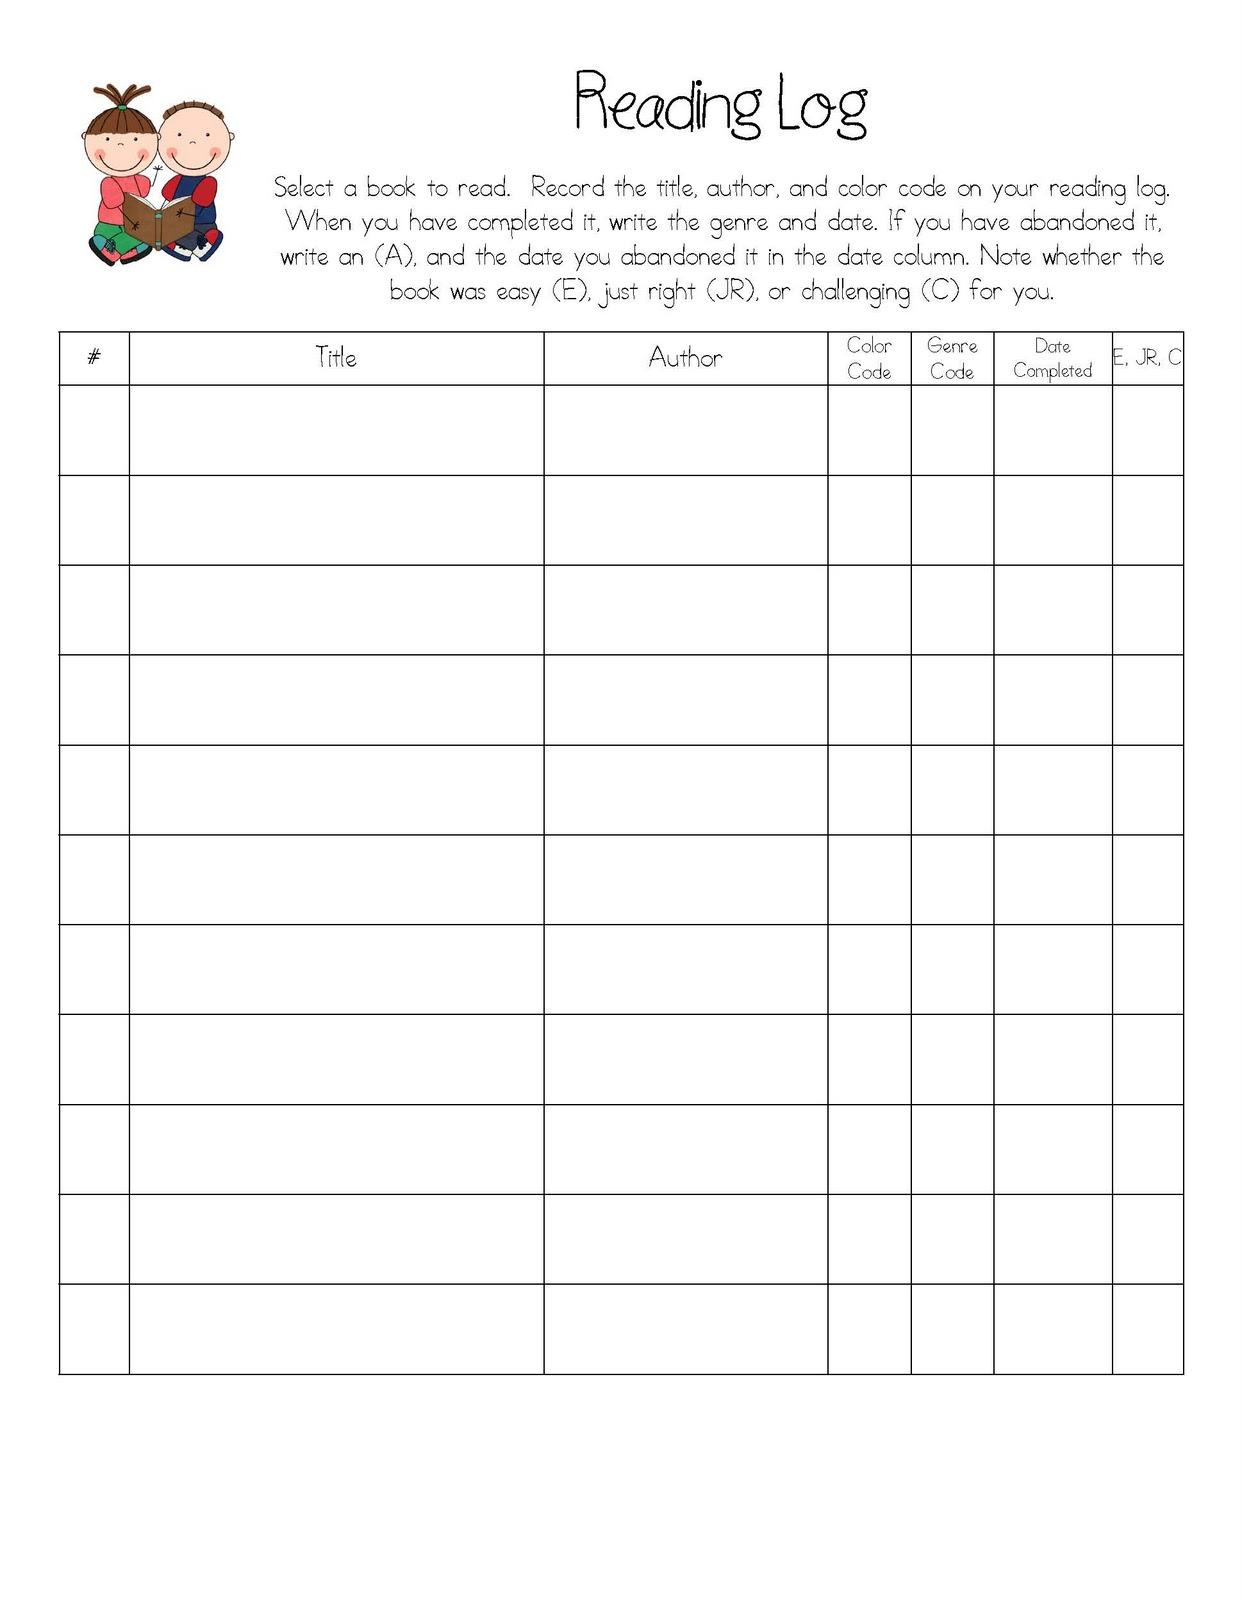 Reading Log Template – Reading Log Worksheets